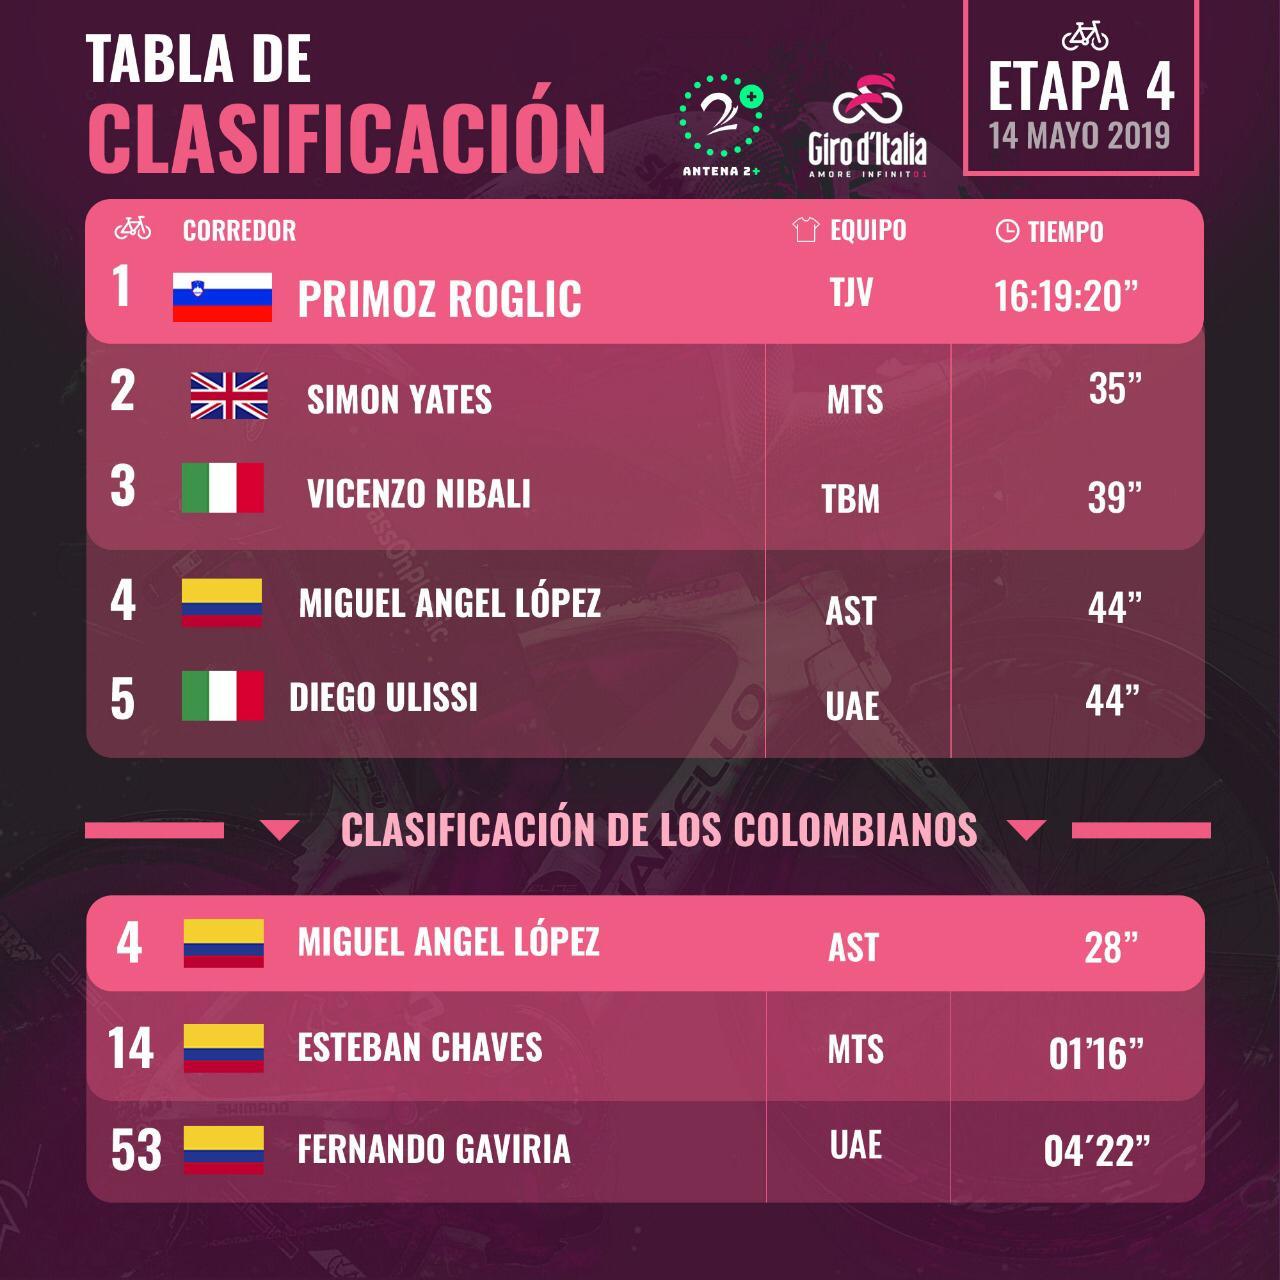 Etapa 4 Giro de Italia